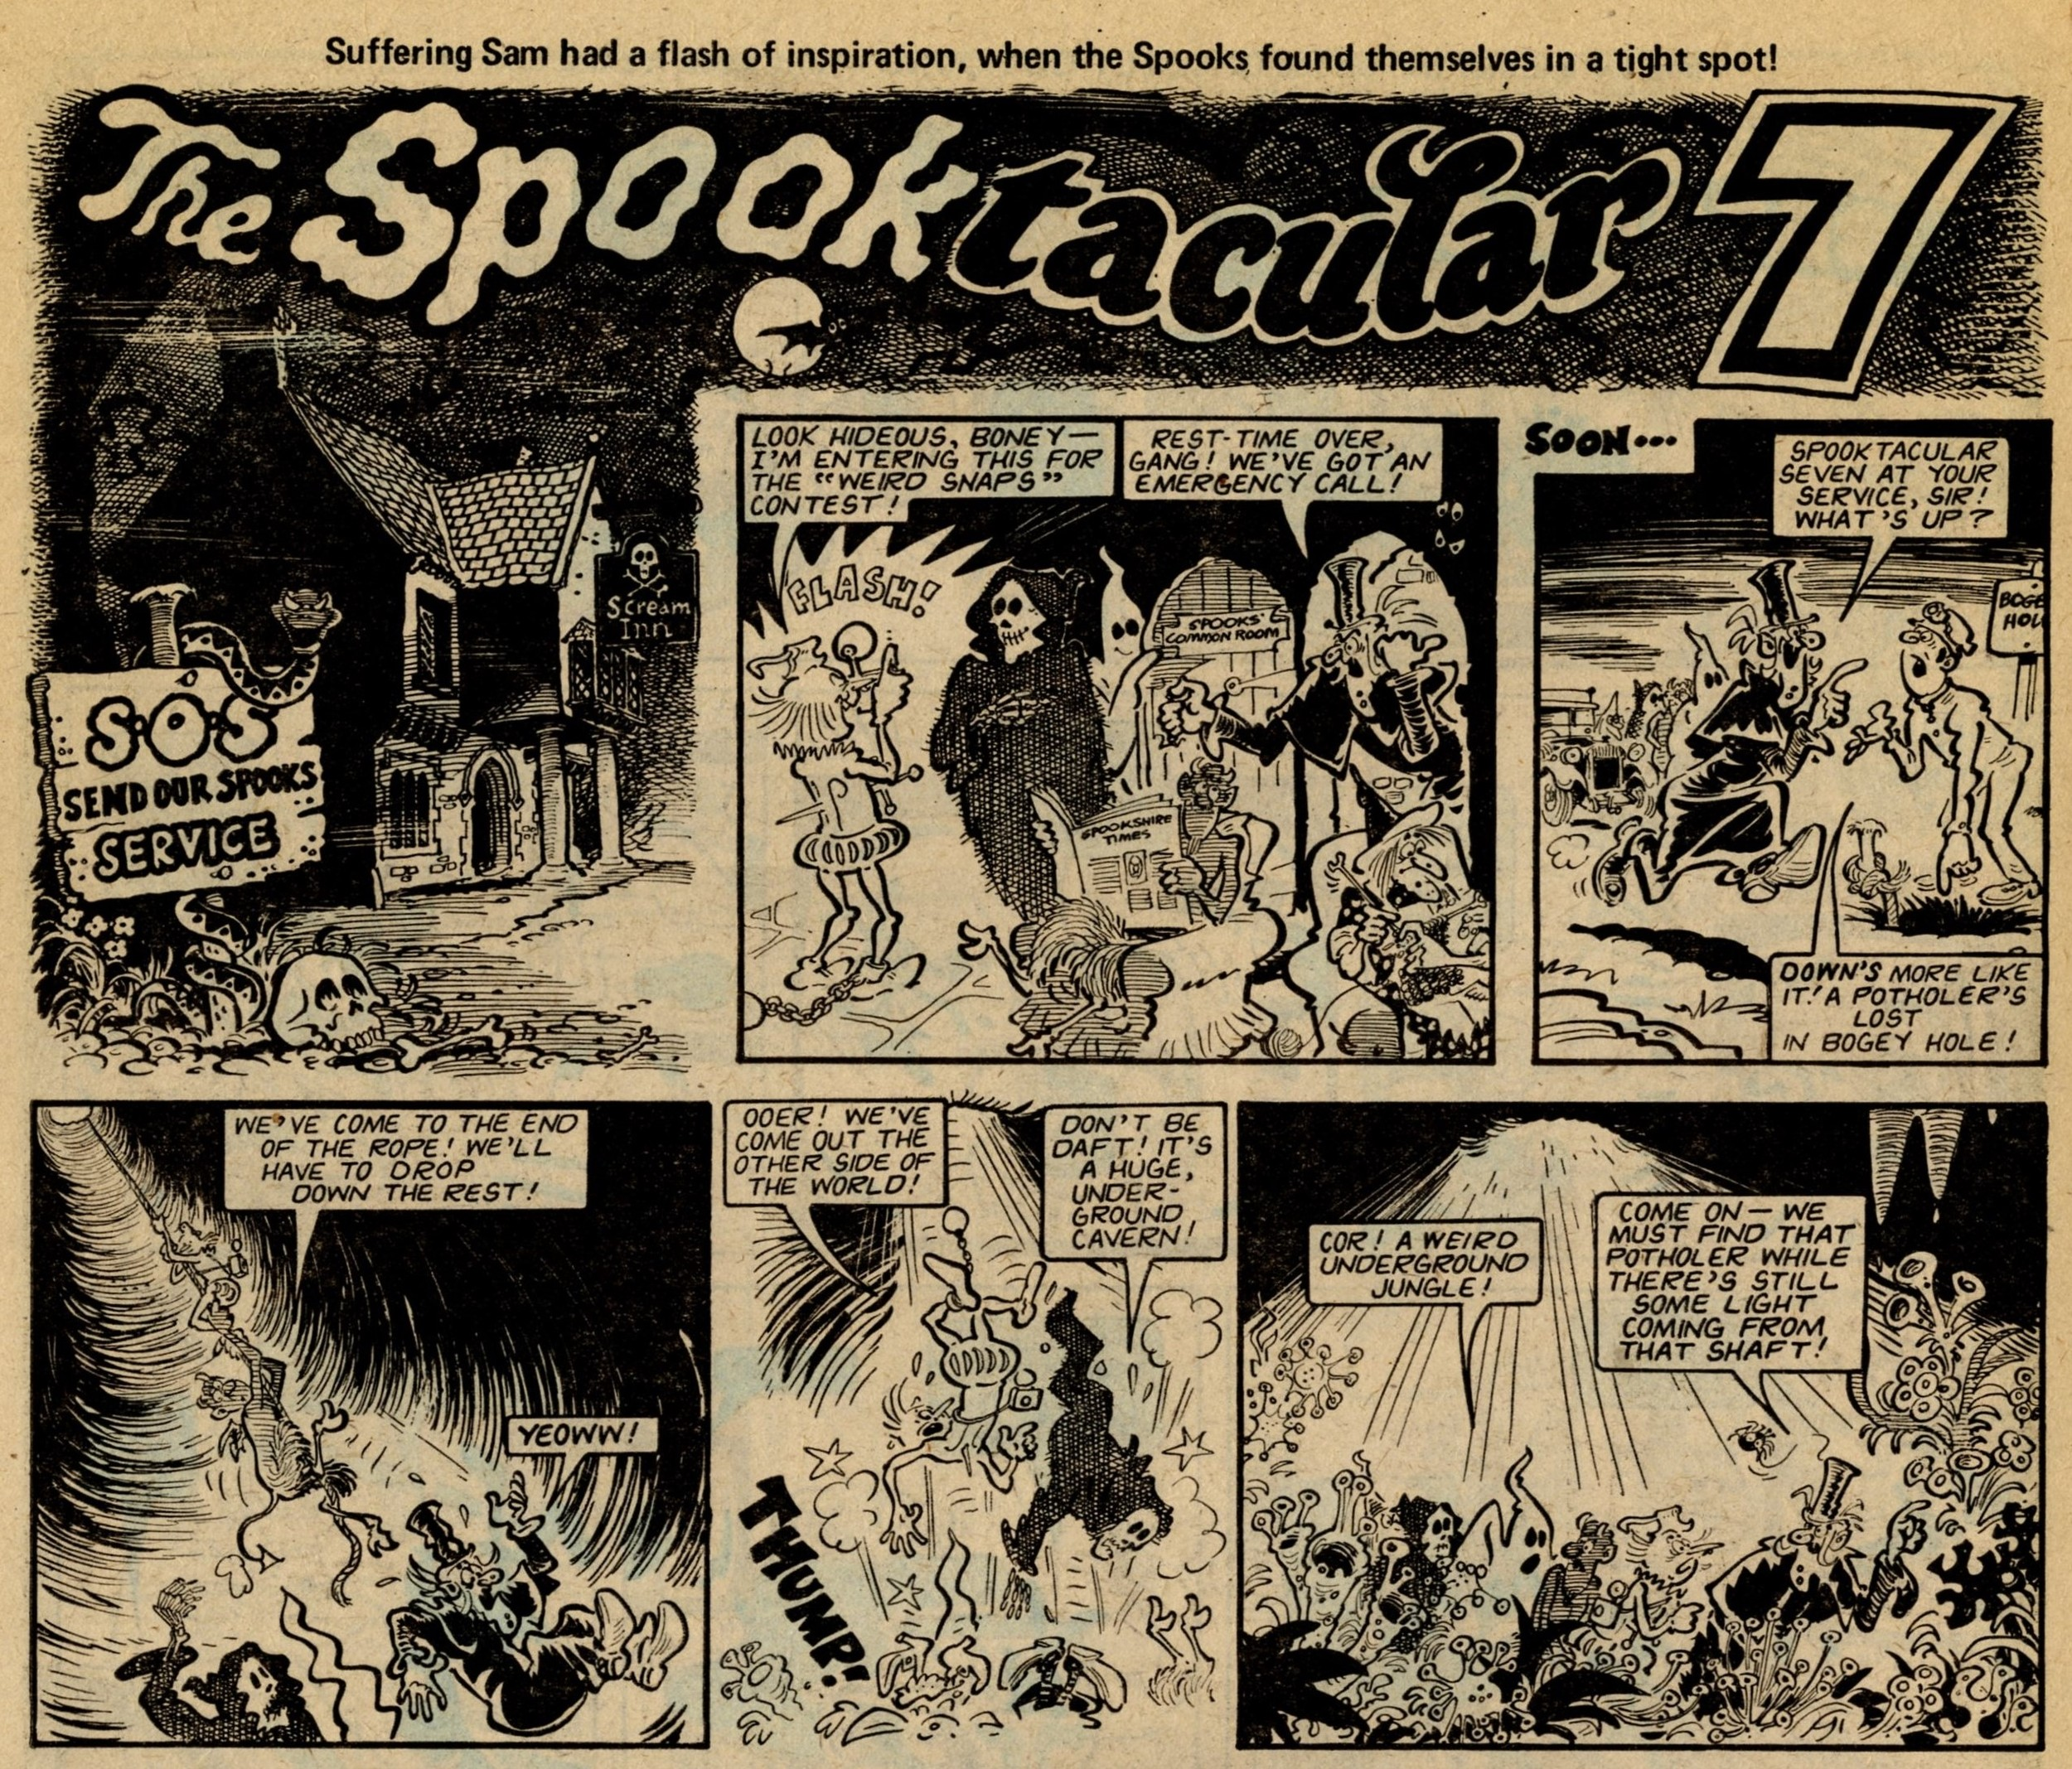 The Spooktacular 7: Brian Walker (artist)